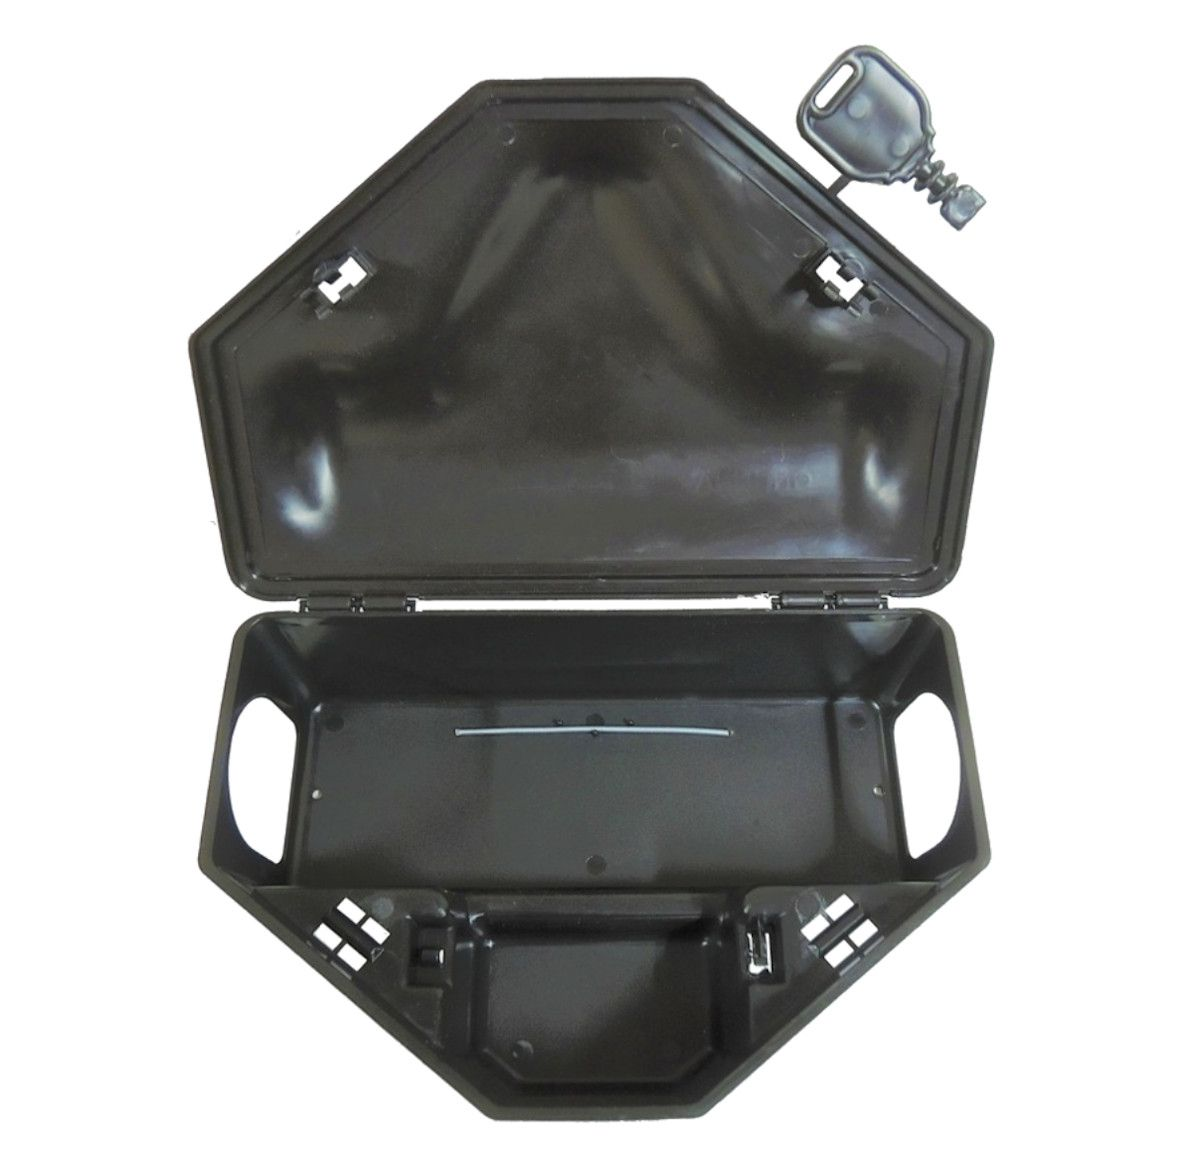 Kit 35 Porta Isca Com 2 Chaves - Duplo Travamento